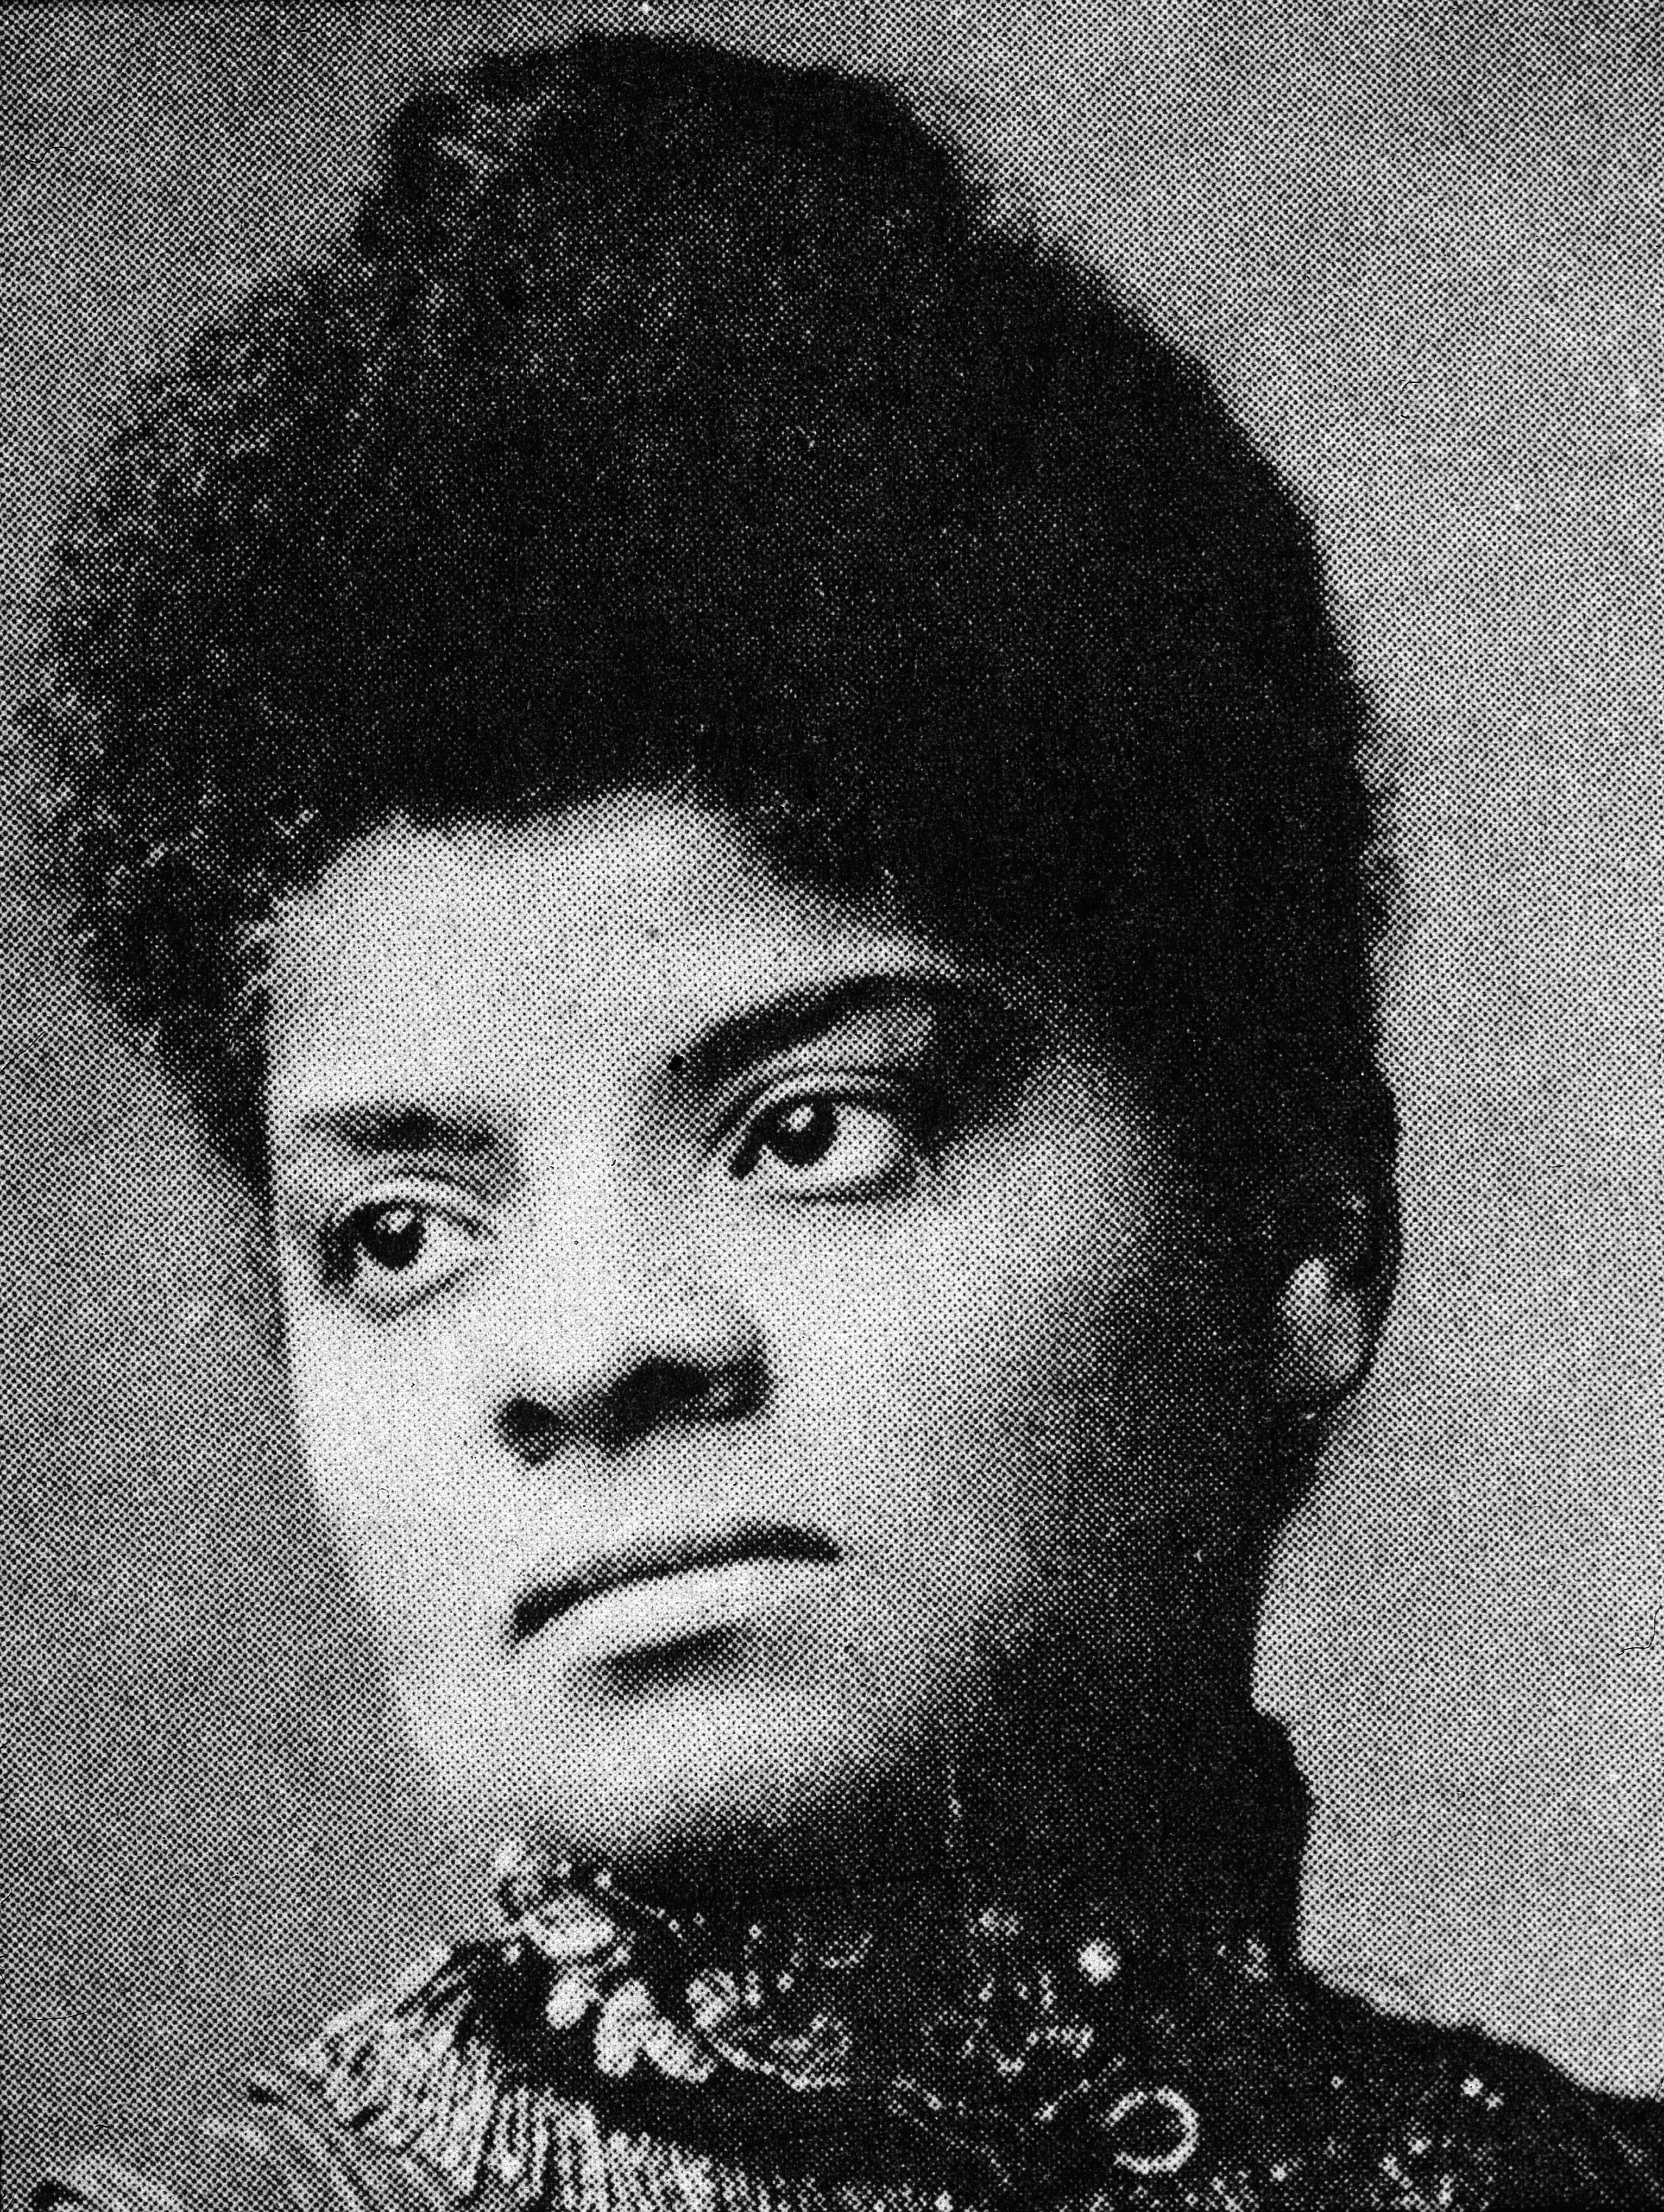 Portrait of American journalist, suffragist and progressive activist Ida B. Wells, circa 1890. (Credit: R. Gates/Hulton Archive/Getty Images)